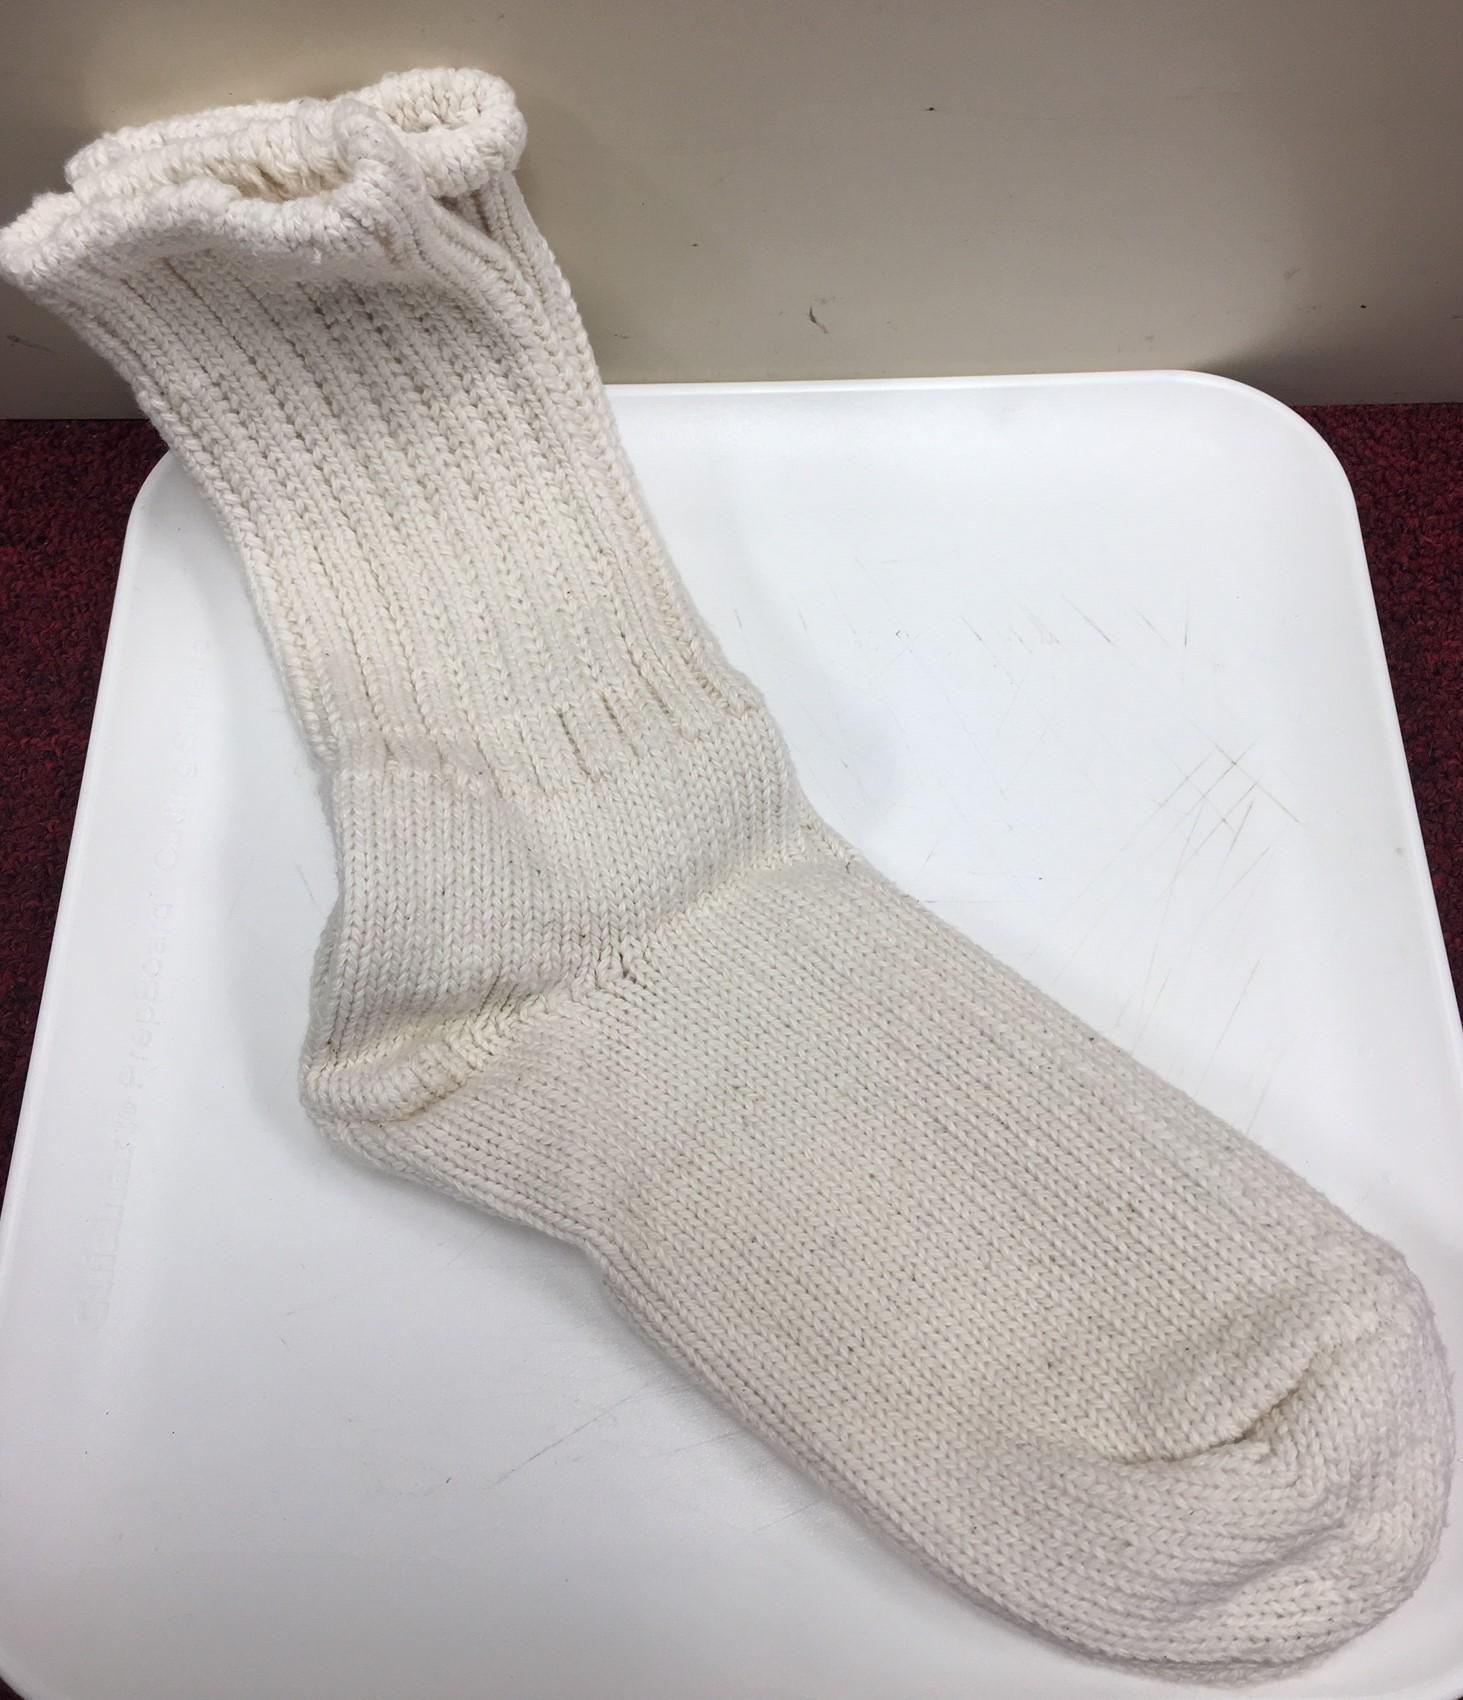 Barry's Super Slouch Socks